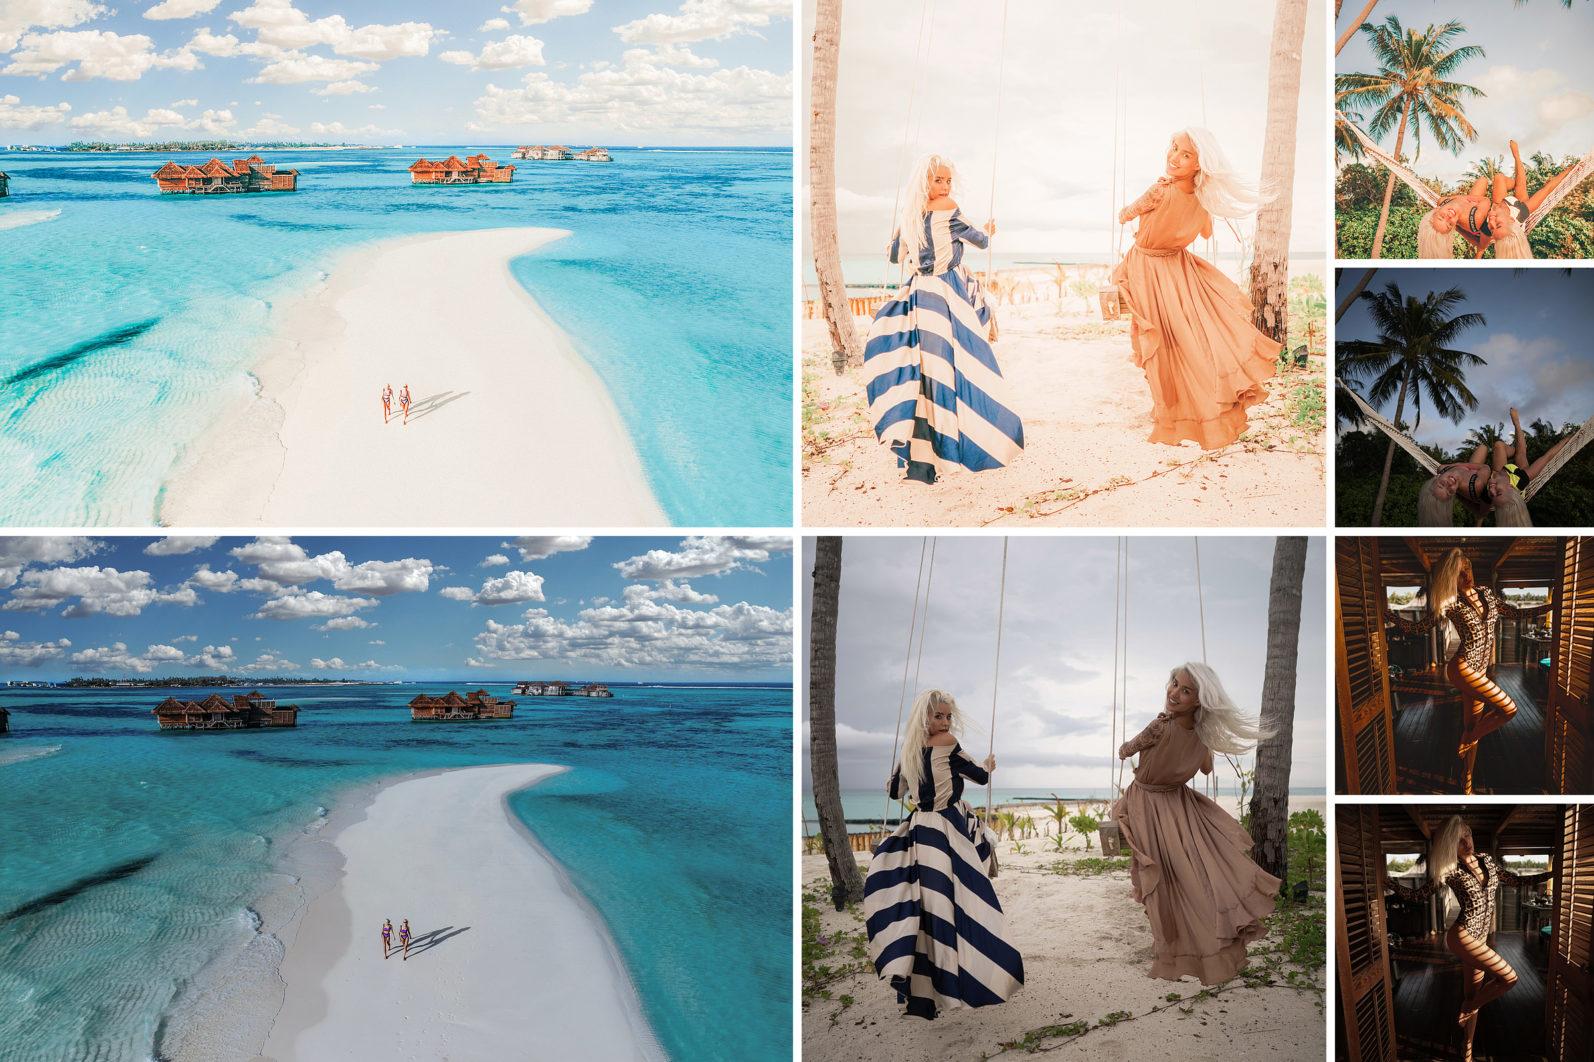 27. Beach Vacation Presets - 27.BEACHVACATIONS 6 -